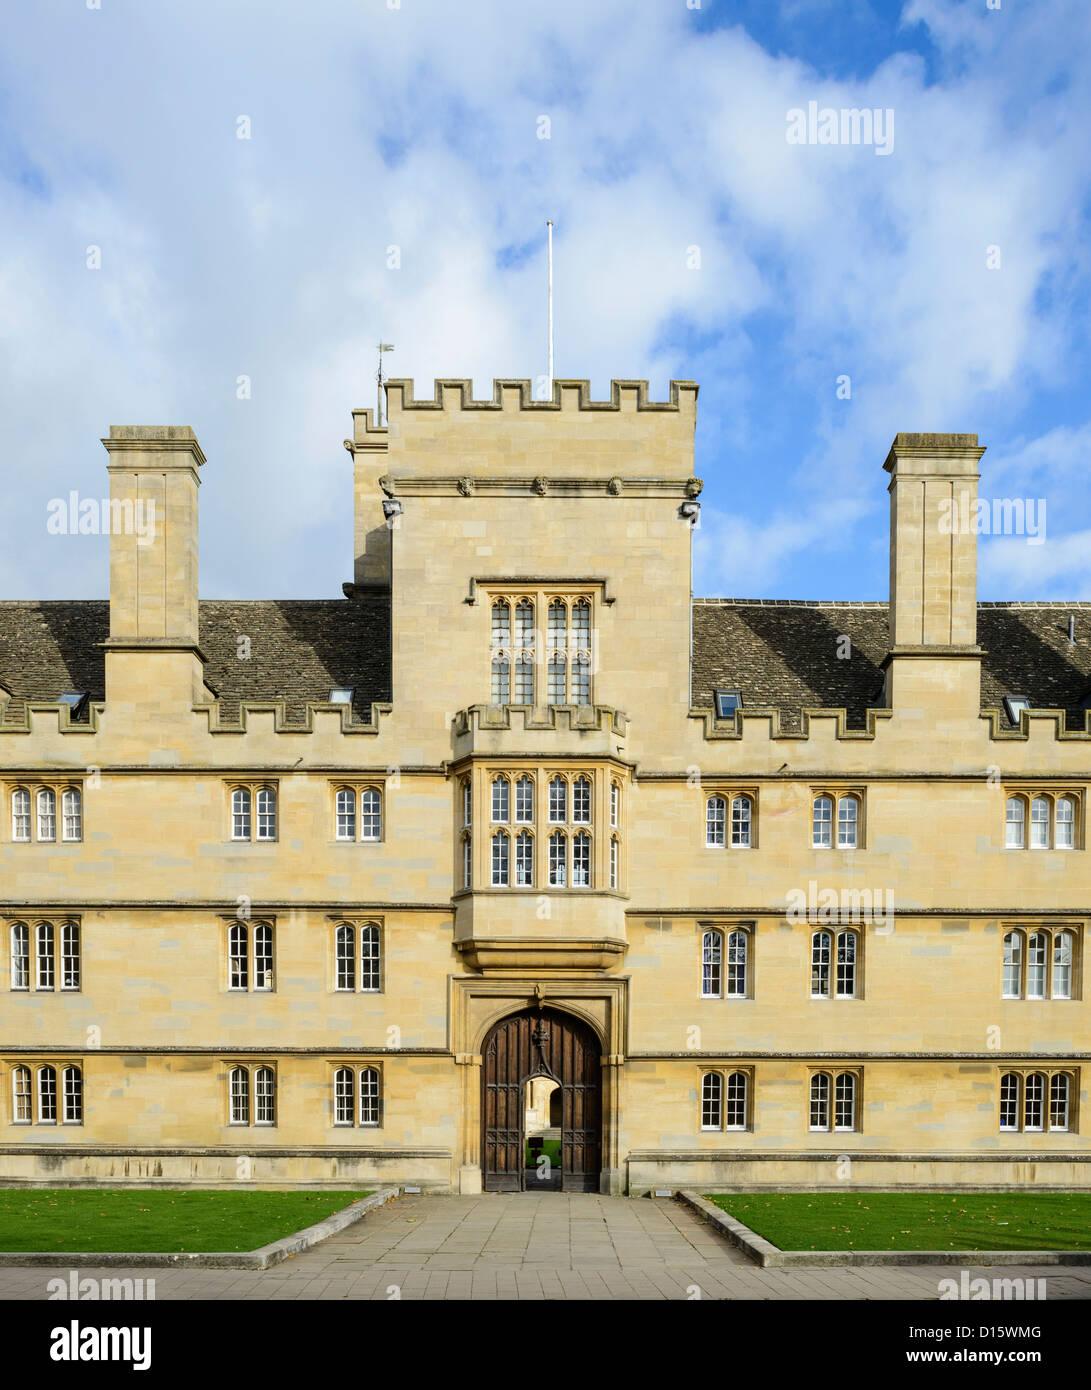 Front entrance of Wadham College Oxford University England UK - Stock Image